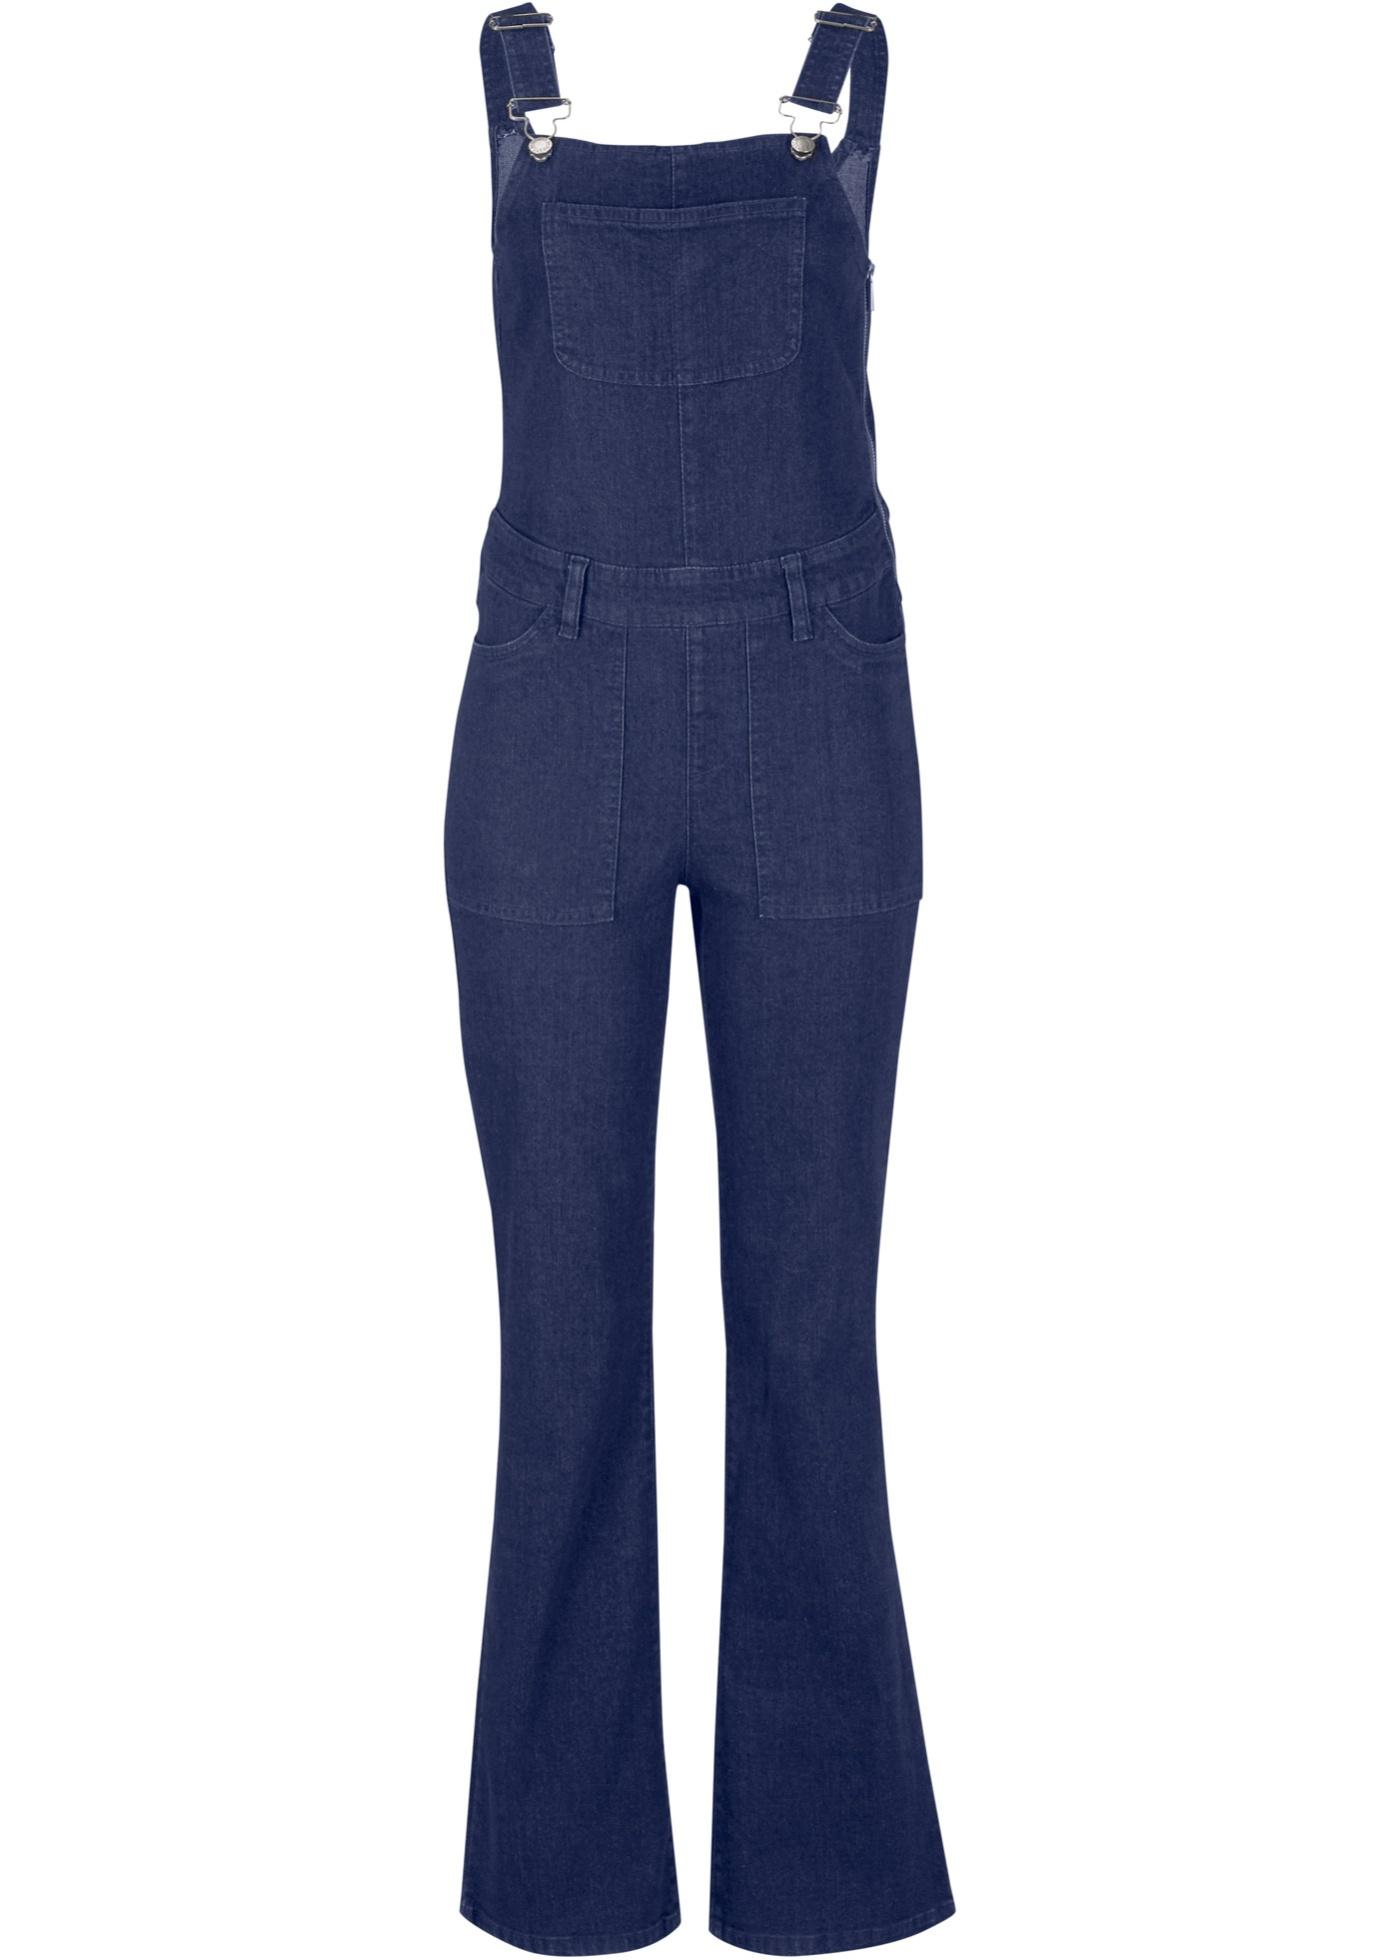 Hosen - Jeans Latzhose › bonprix › blau  - Onlineshop Bonprix